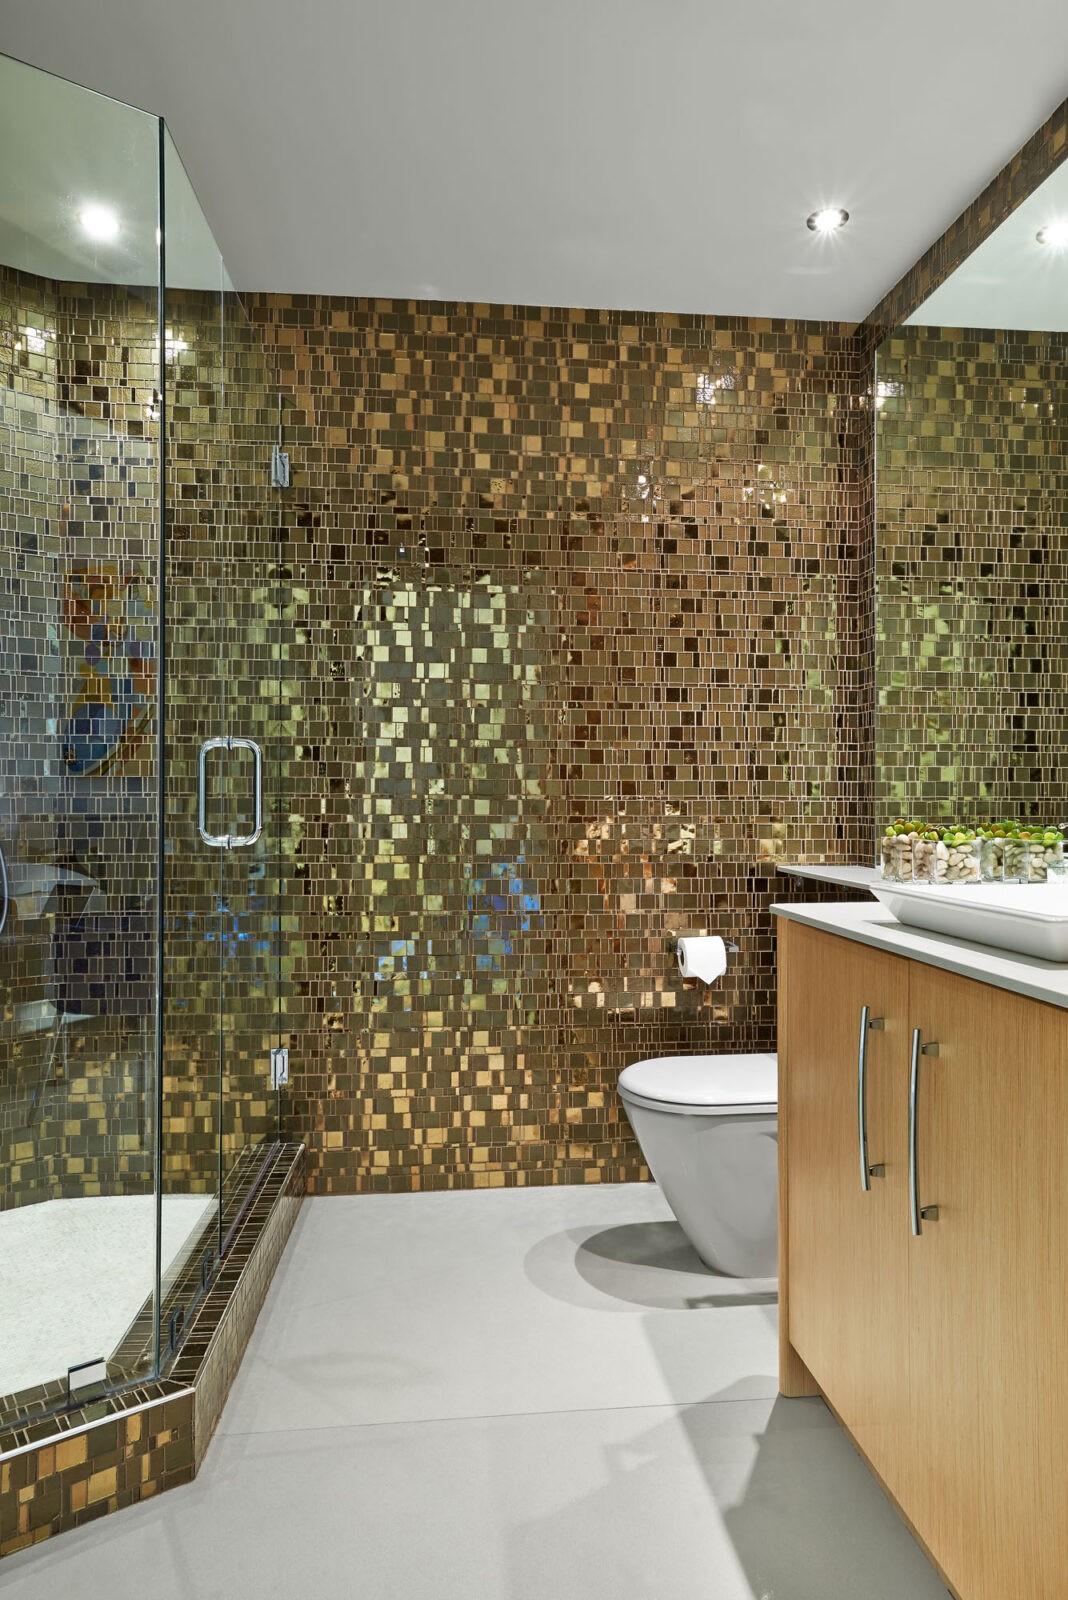 Floor Wall Tiles Italian Design Arctic Vintage Blue Mosaic Tiles Walls Floors Bathrooms Home Furniture Diy Anwalt Bevensen De